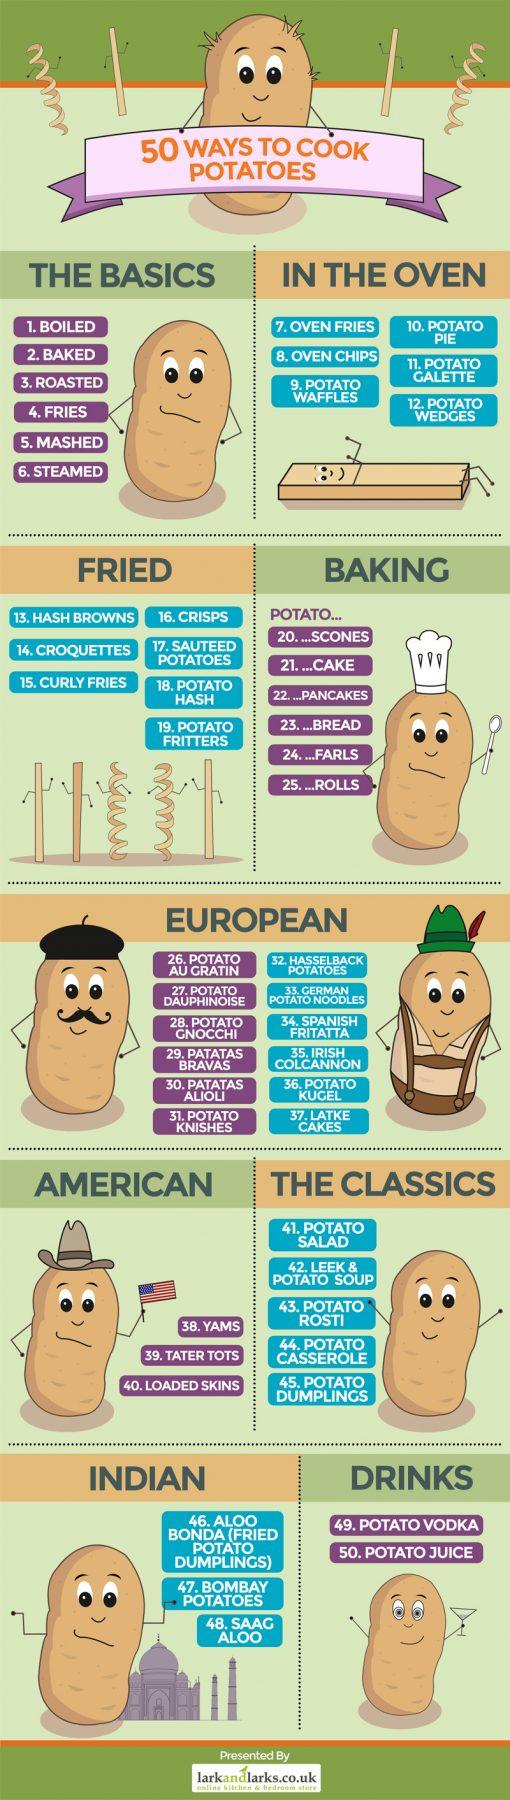 Lark & Lark's 50 Ways to Cook Potatoes on LaughingLemonPie.com